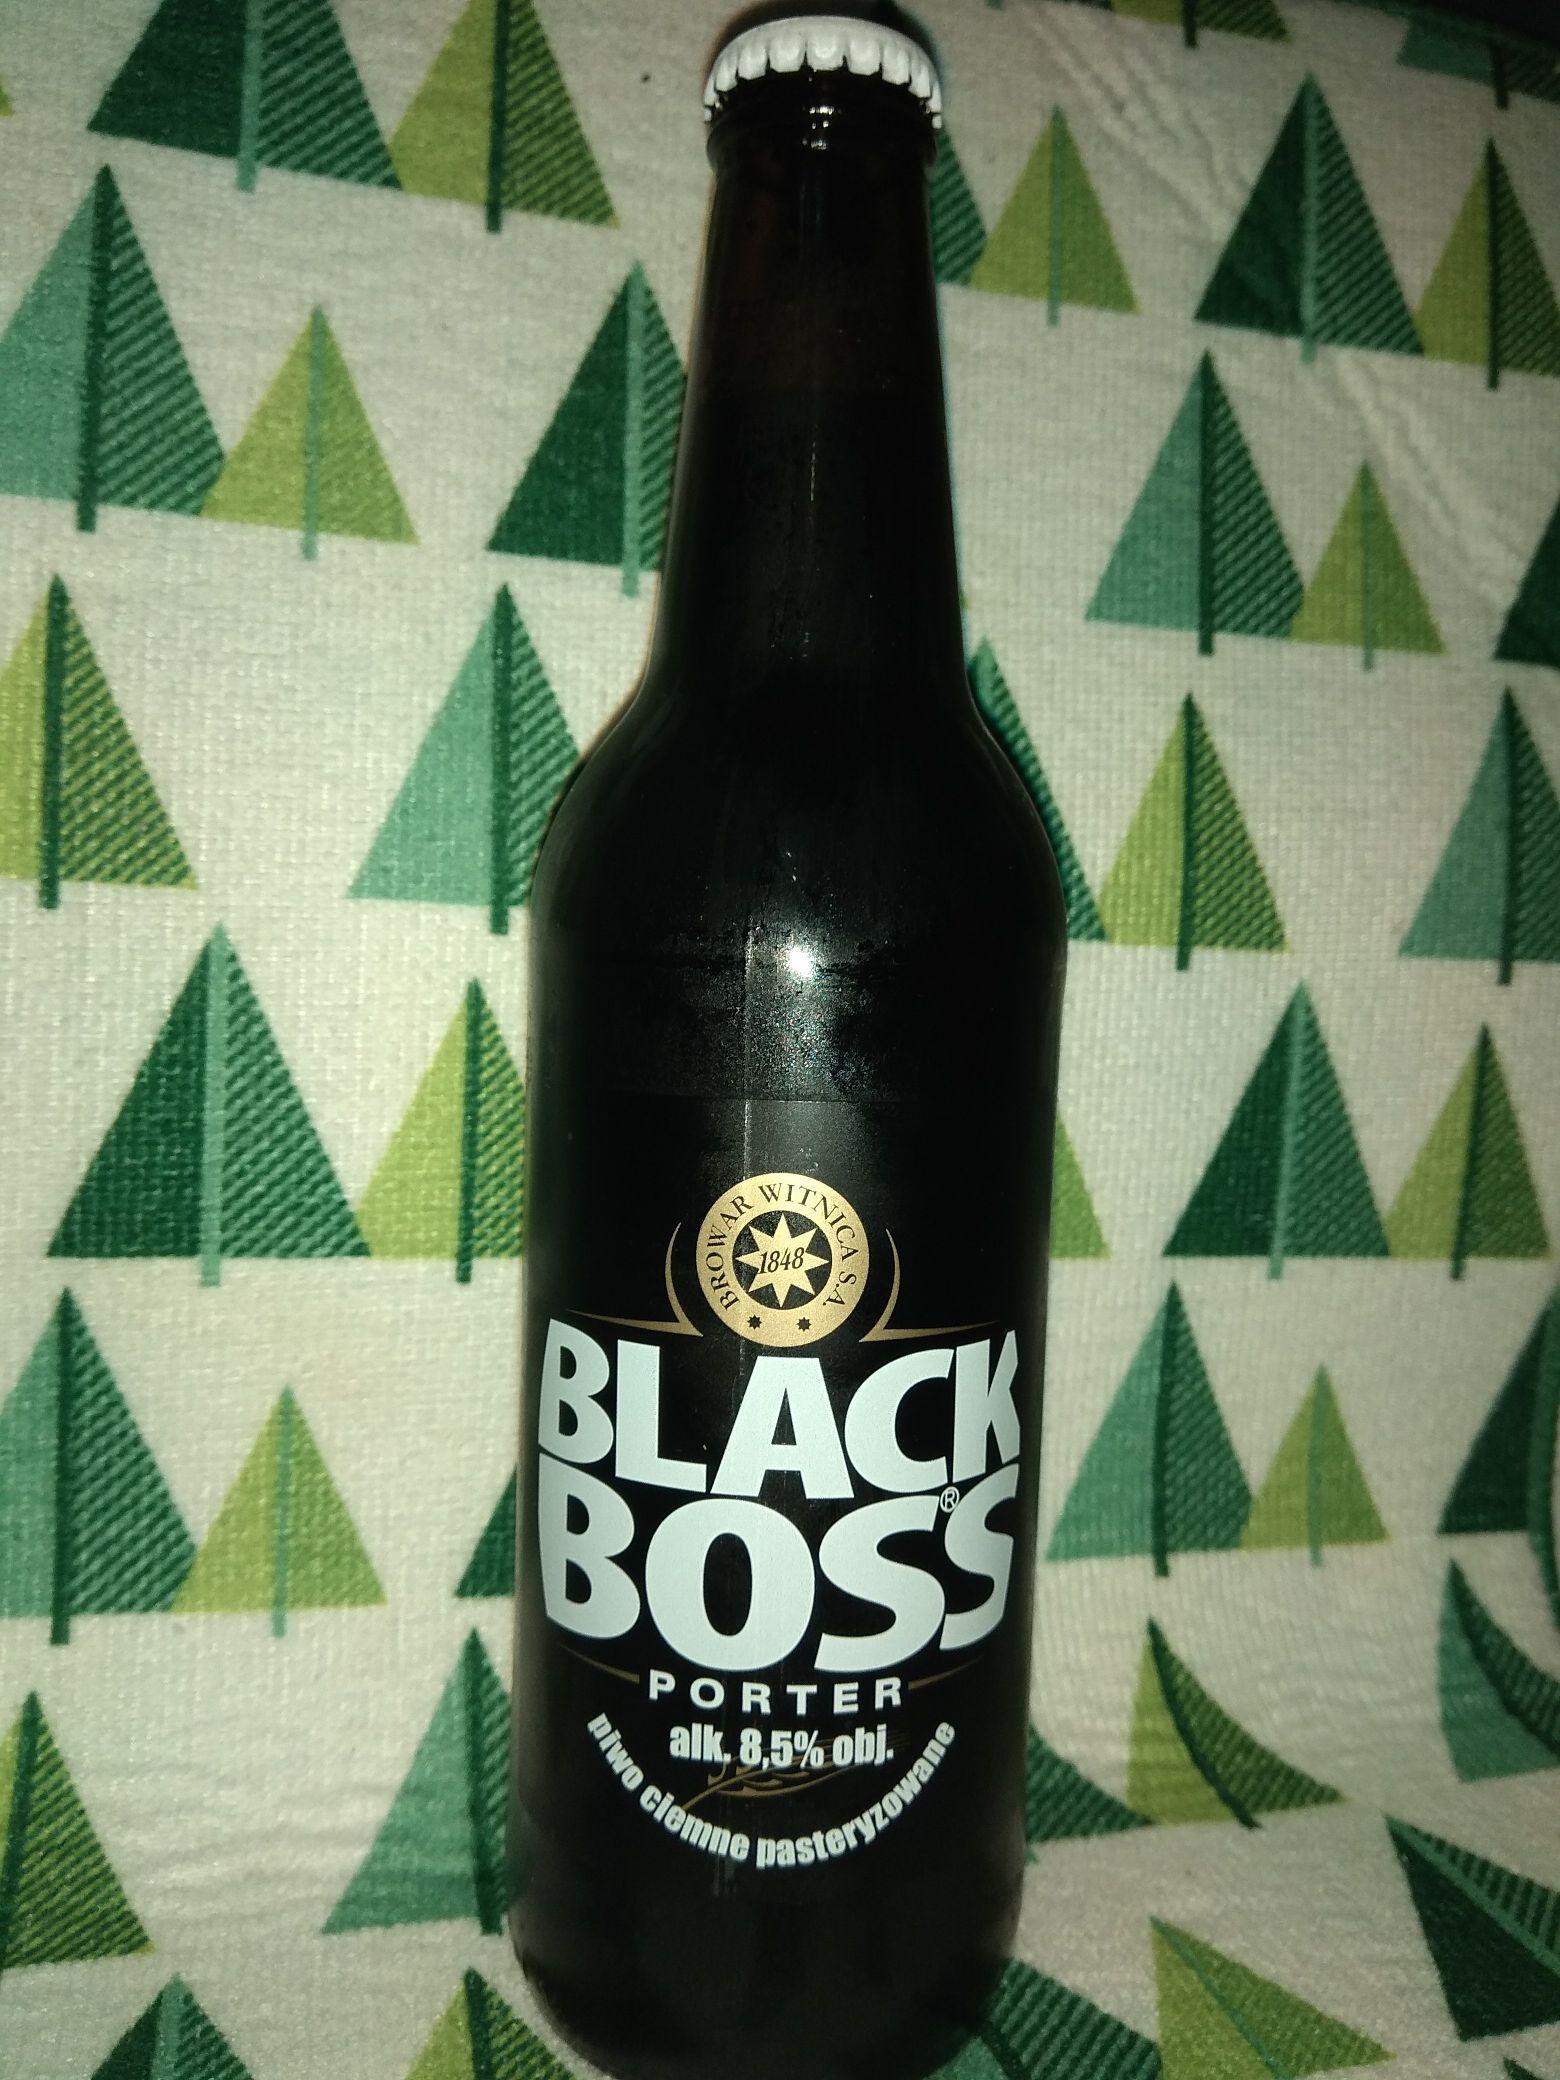 Piwo Black Boss Porter w Mila